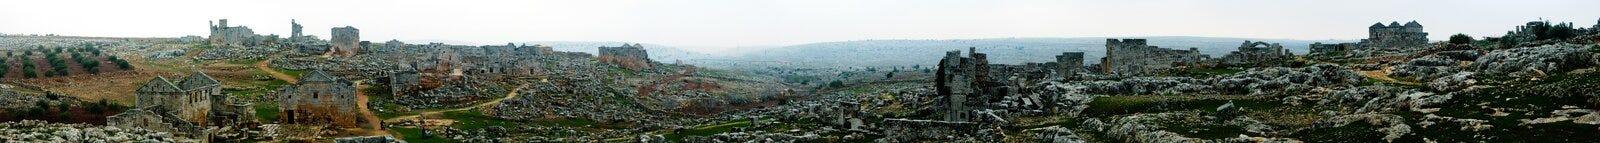 Panorama da cidade inoperante abandonada arruinada Serjilla em Síria foto de stock